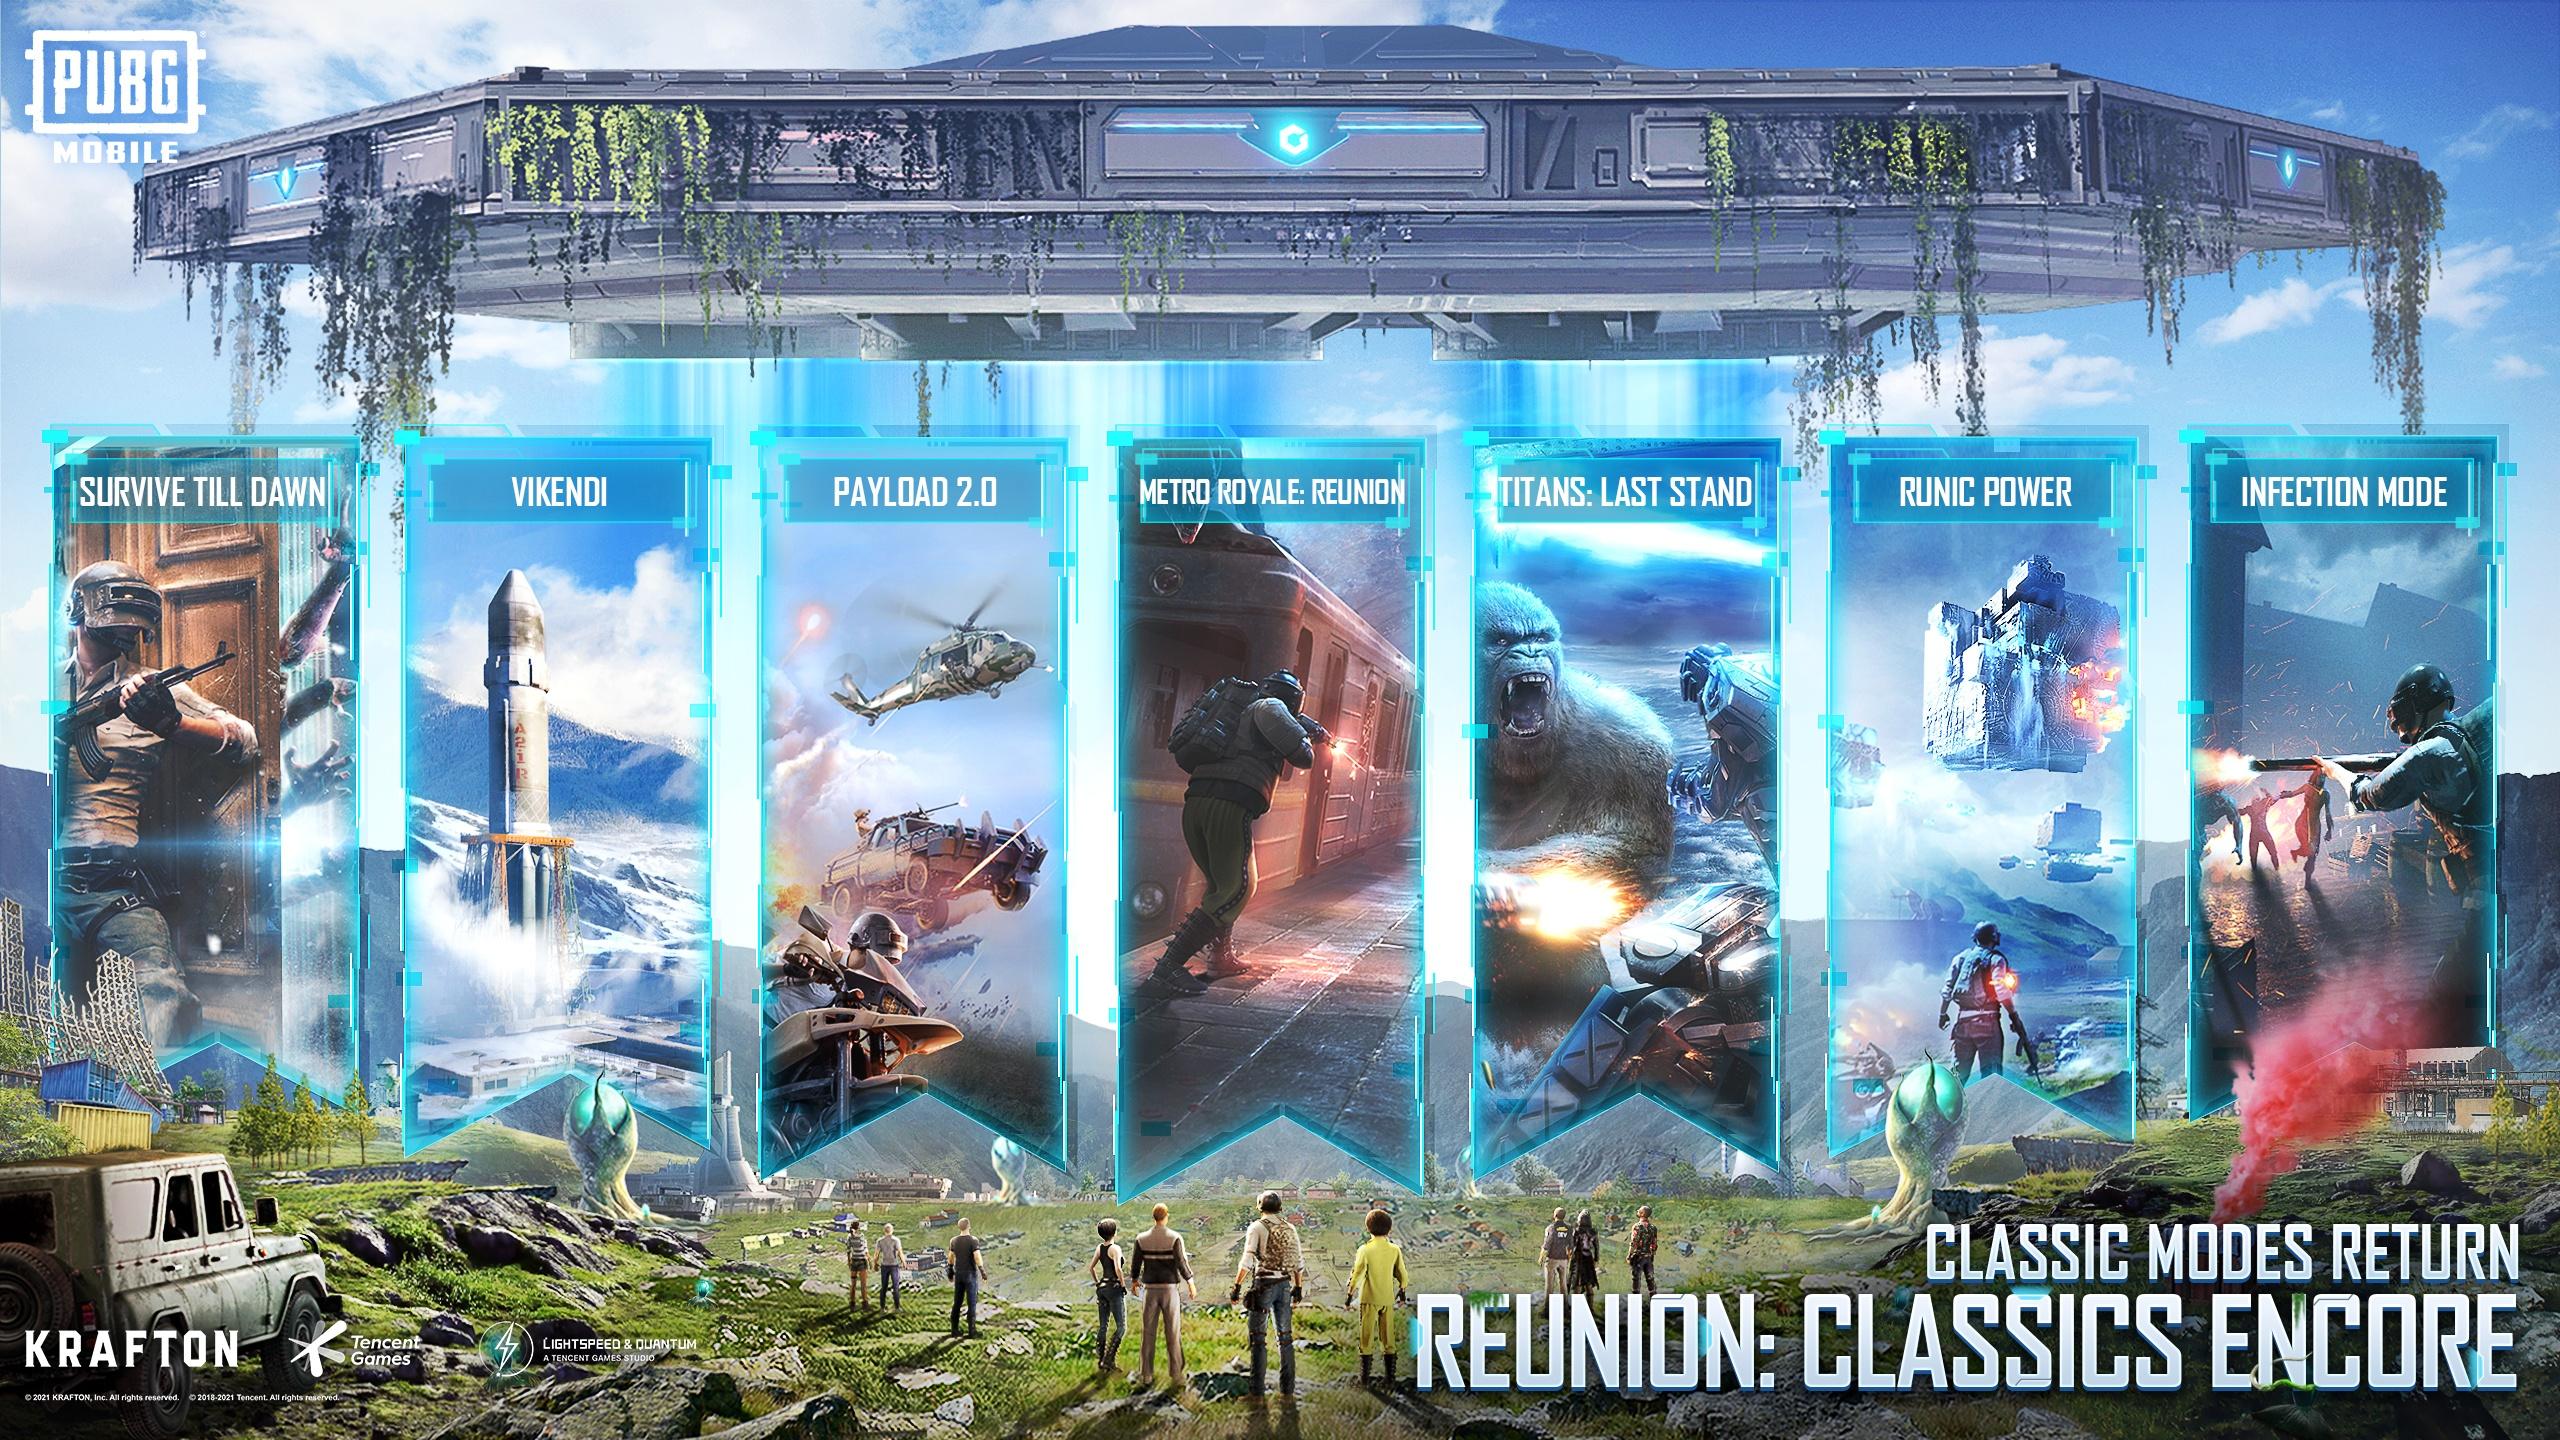 Classic Game Modes Make a Return in PUBG Mobile